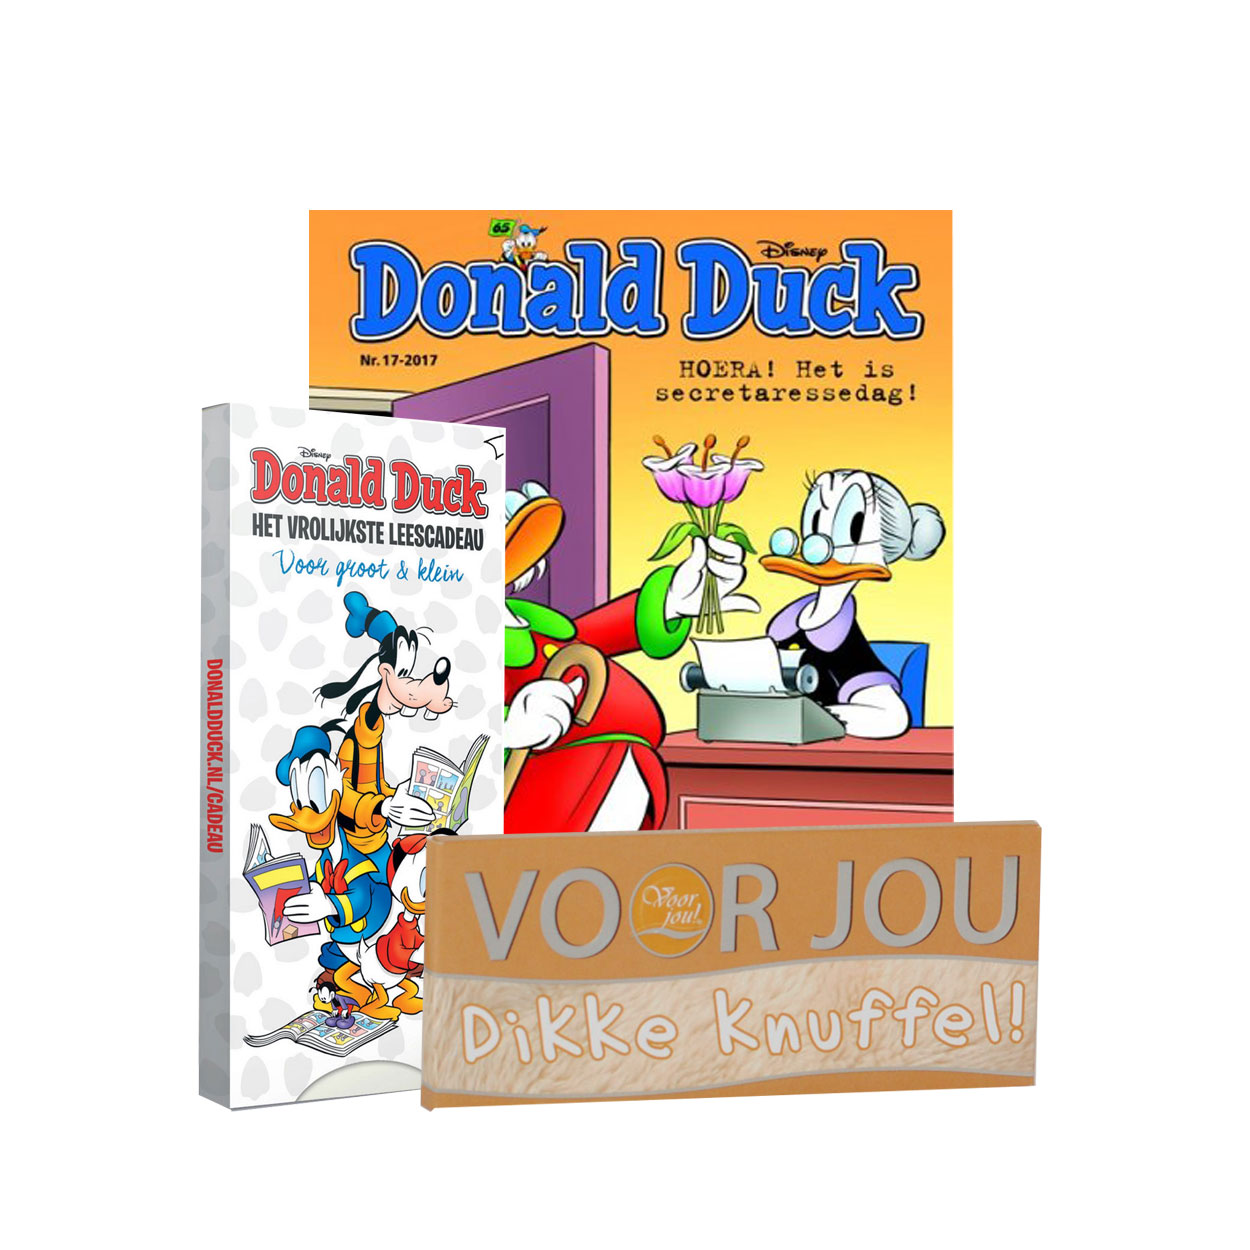 Bladcadeau 15 Euro Donald Duck